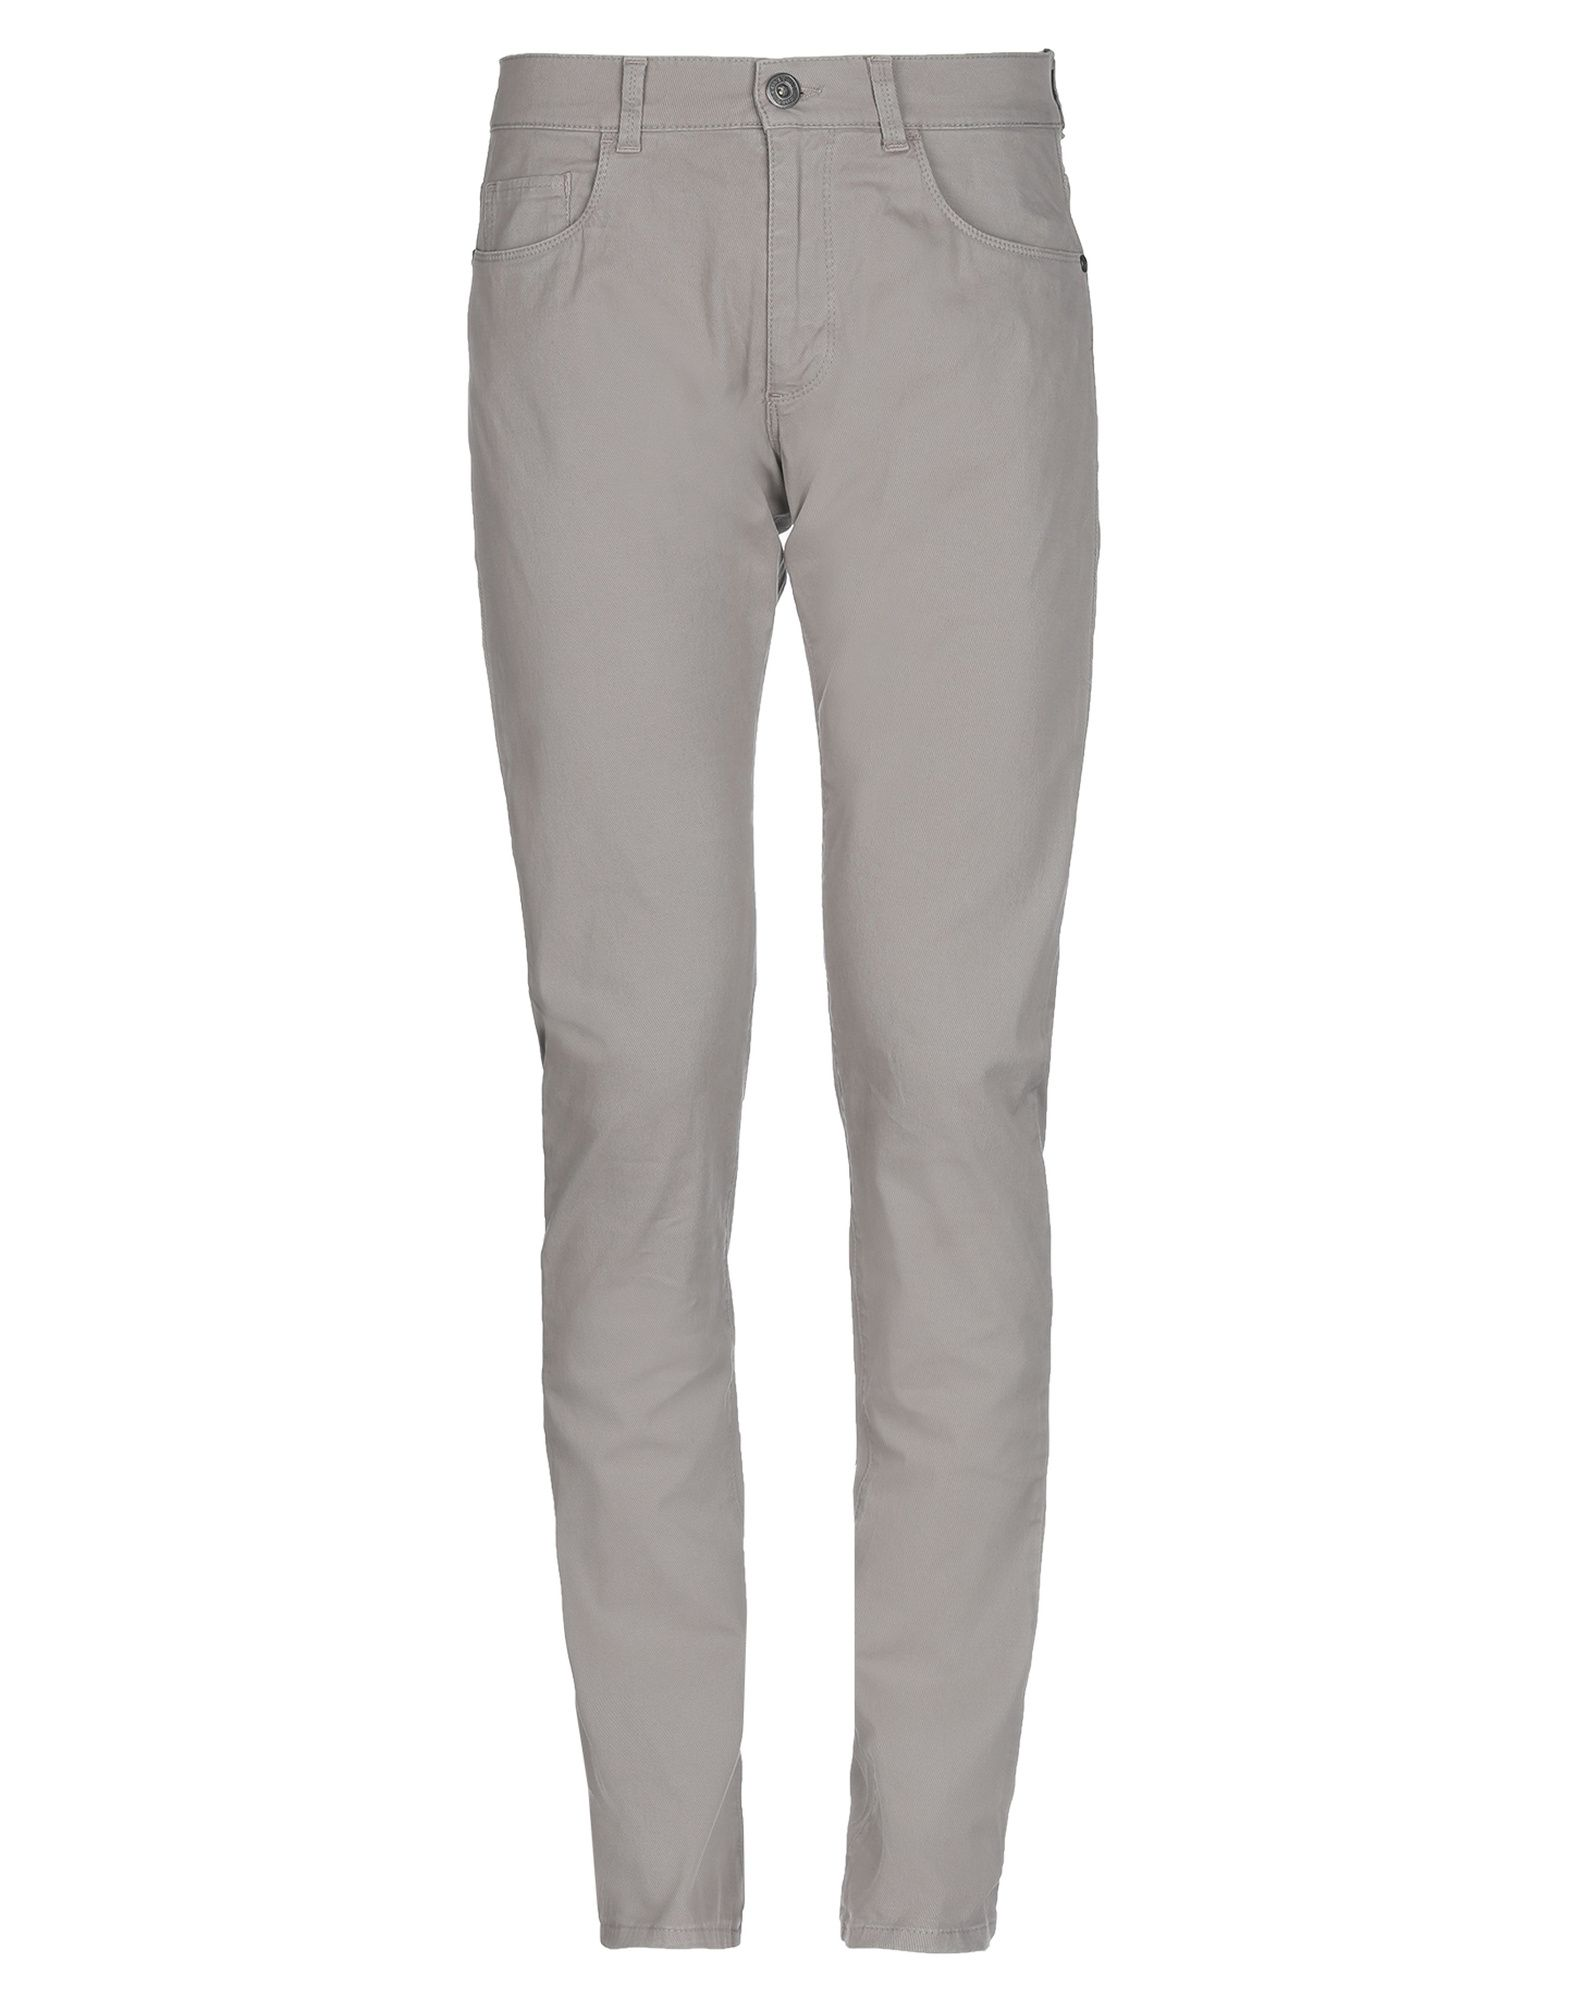 5 Tasche Trussardi Jeans uomo - 42734650GV 42734650GV  fabrik direkt